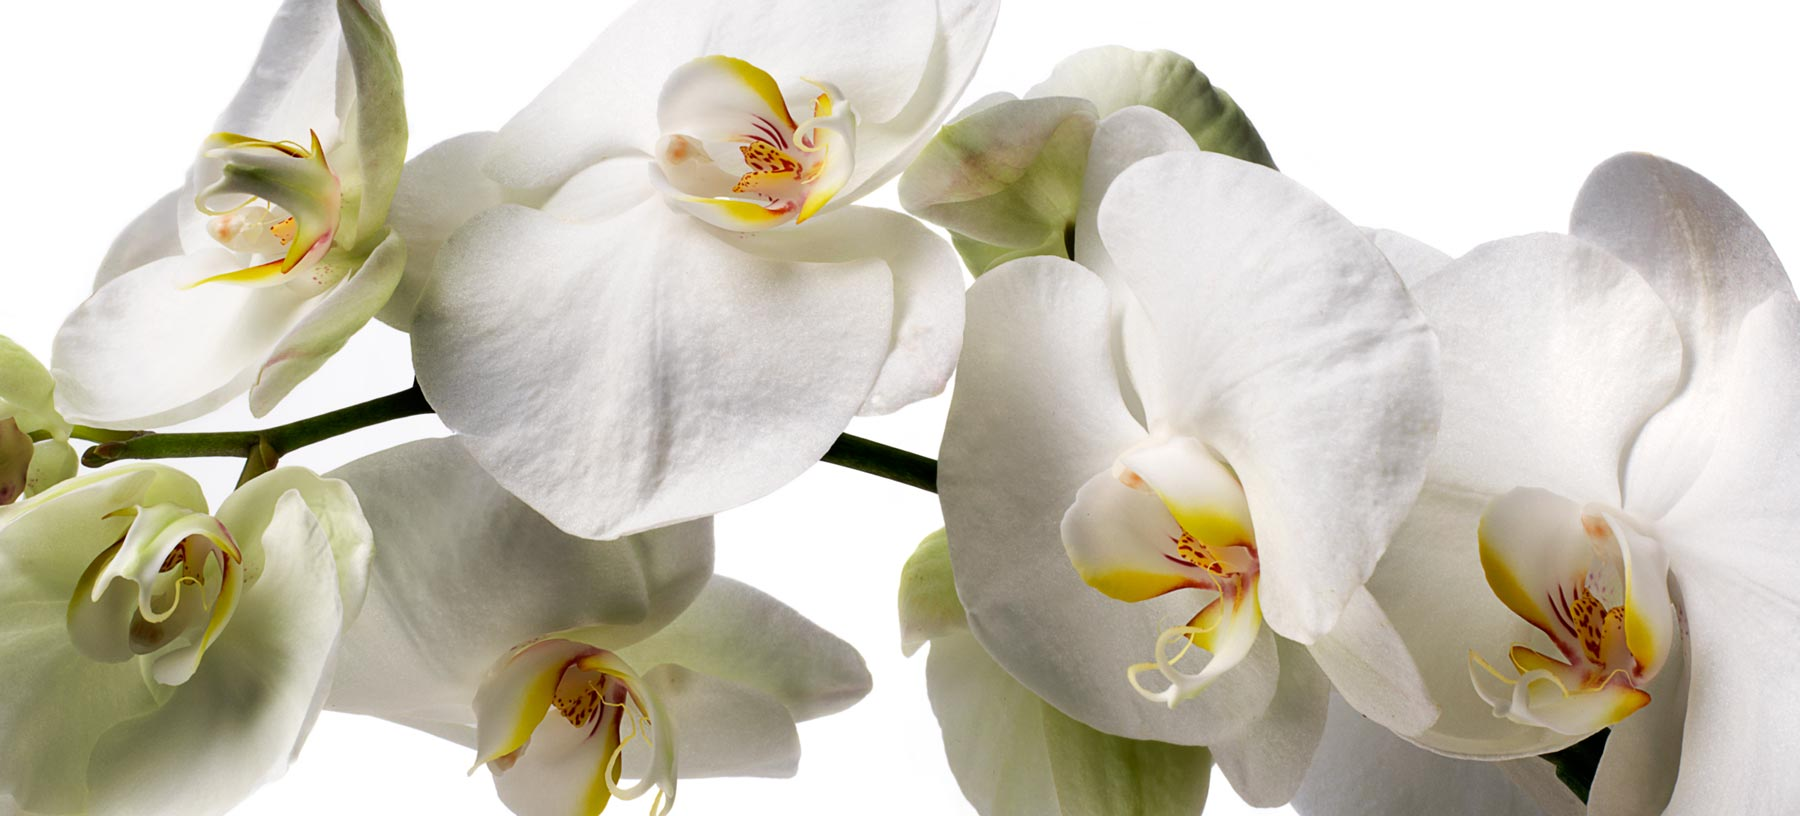 Phalaenopsis Cut Orchids